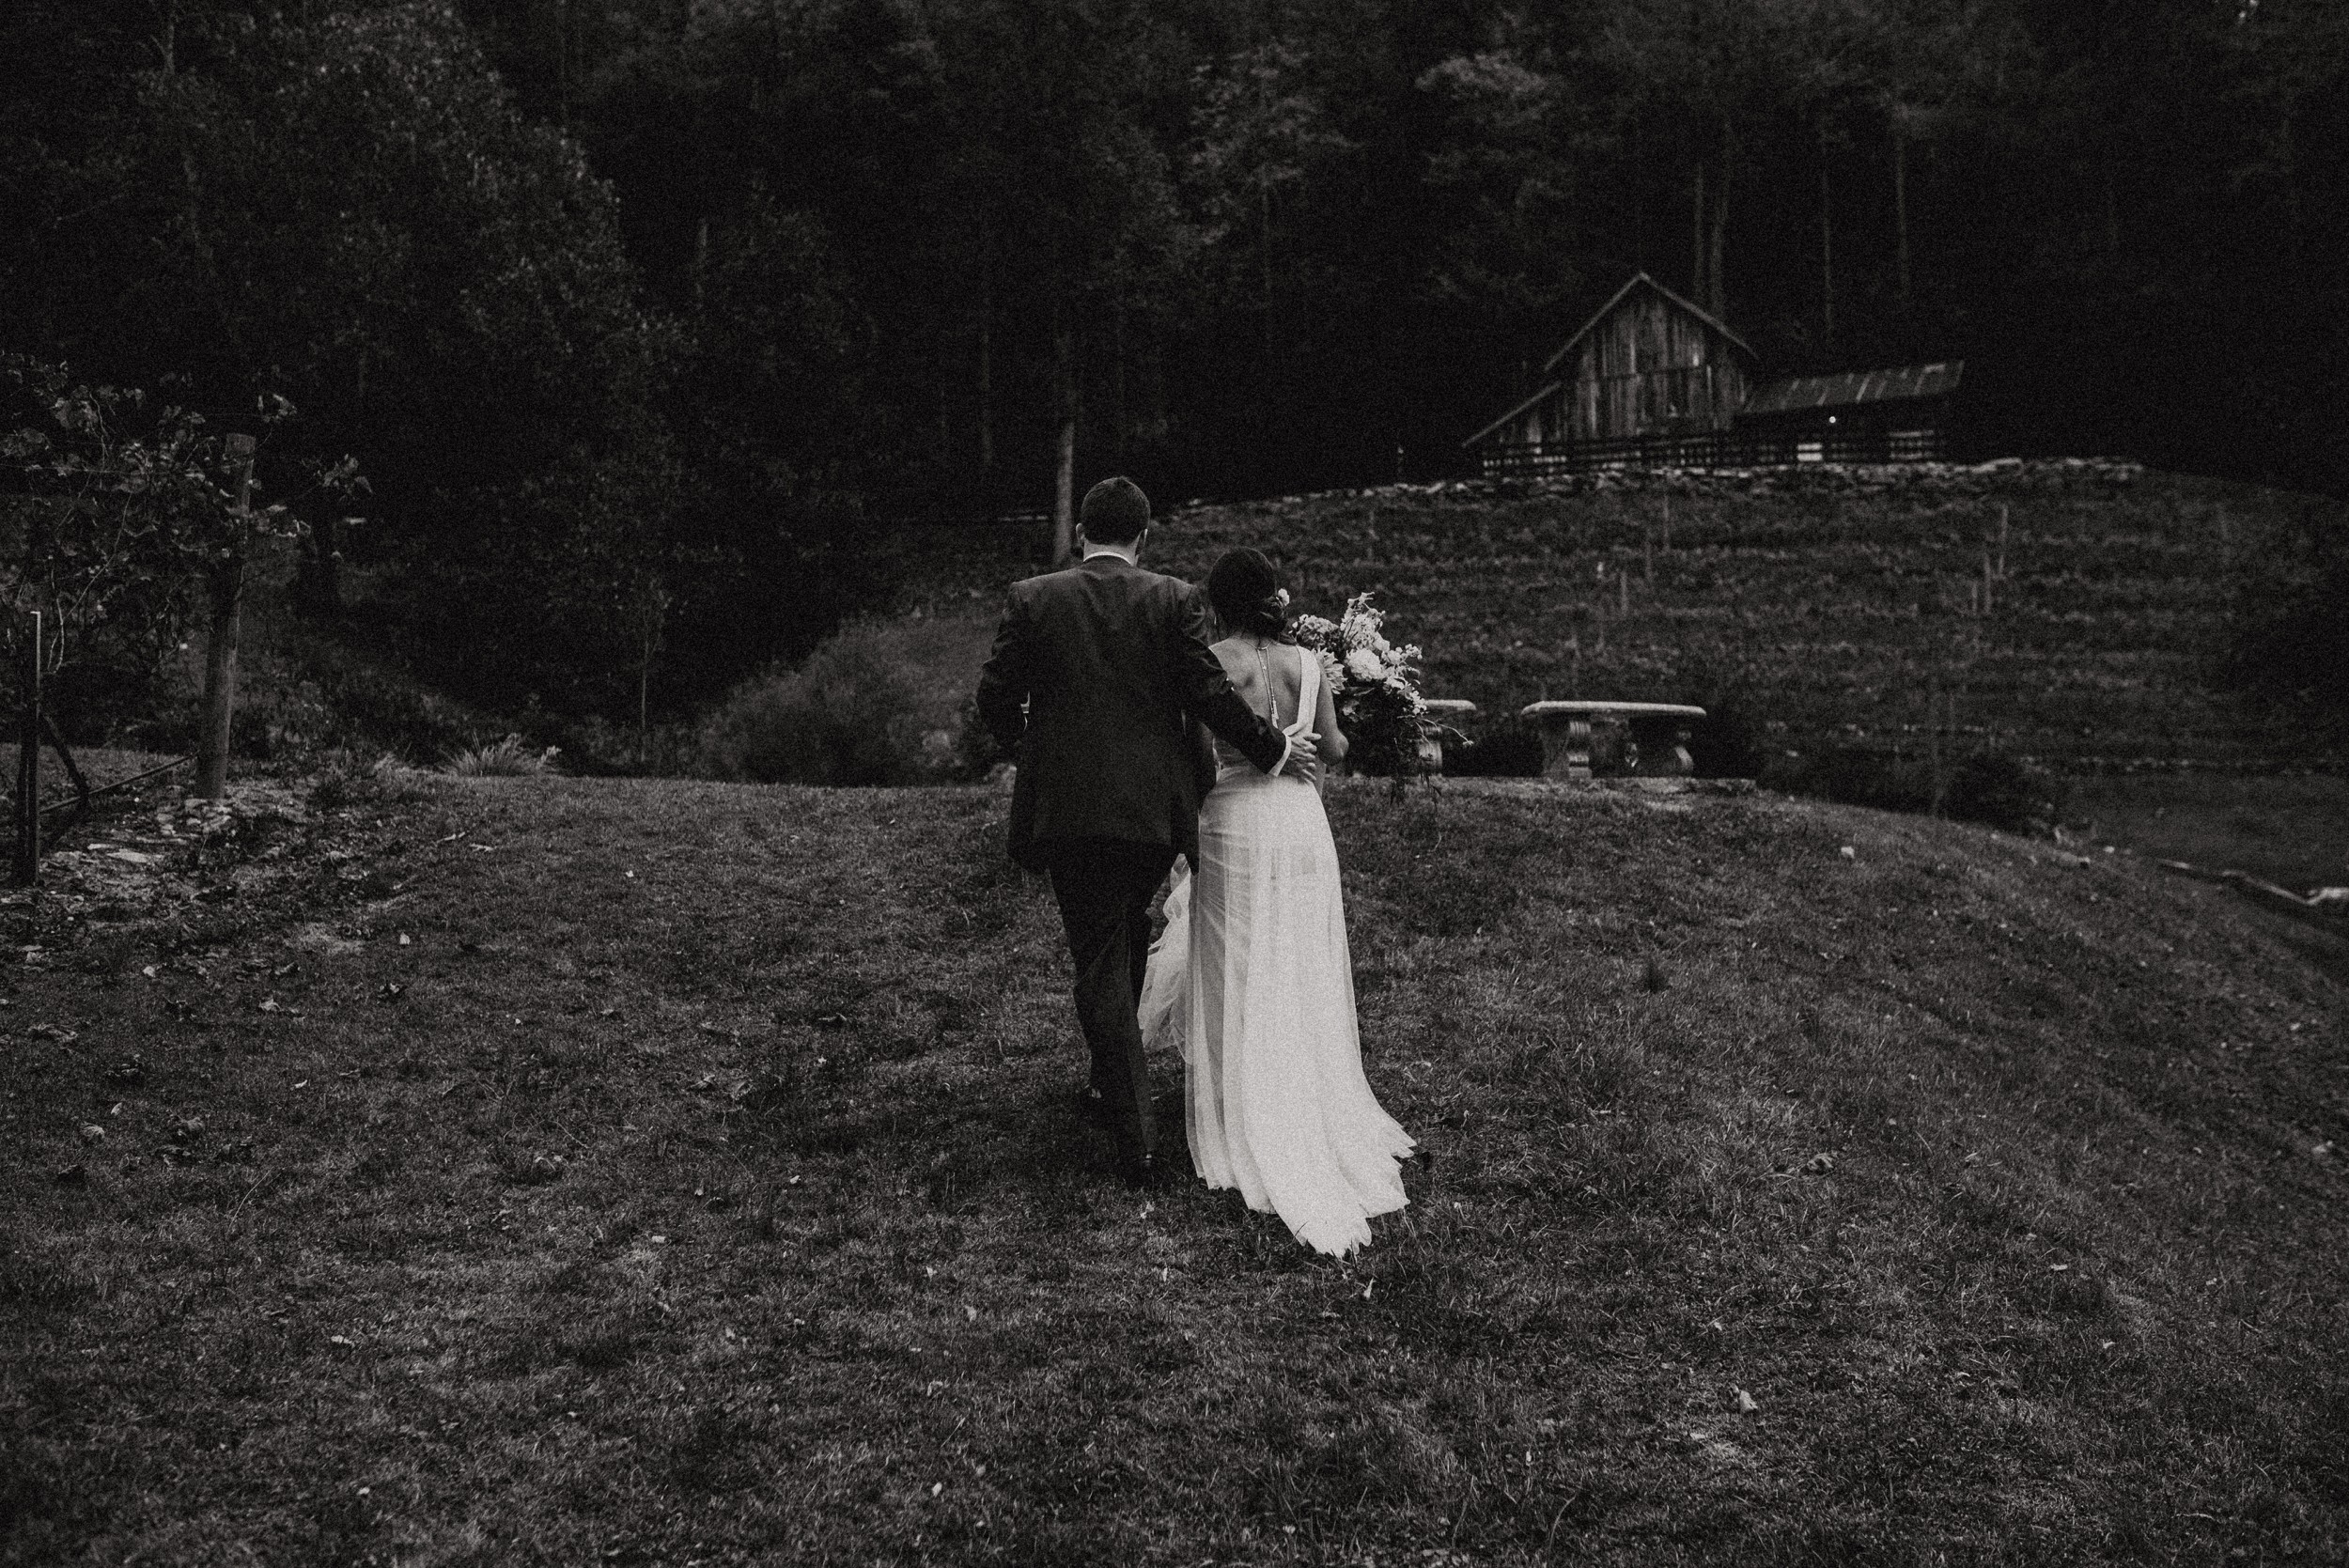 north-carolina-fall-vineyard-wedding-vanessaalvesphotography-78.jpg